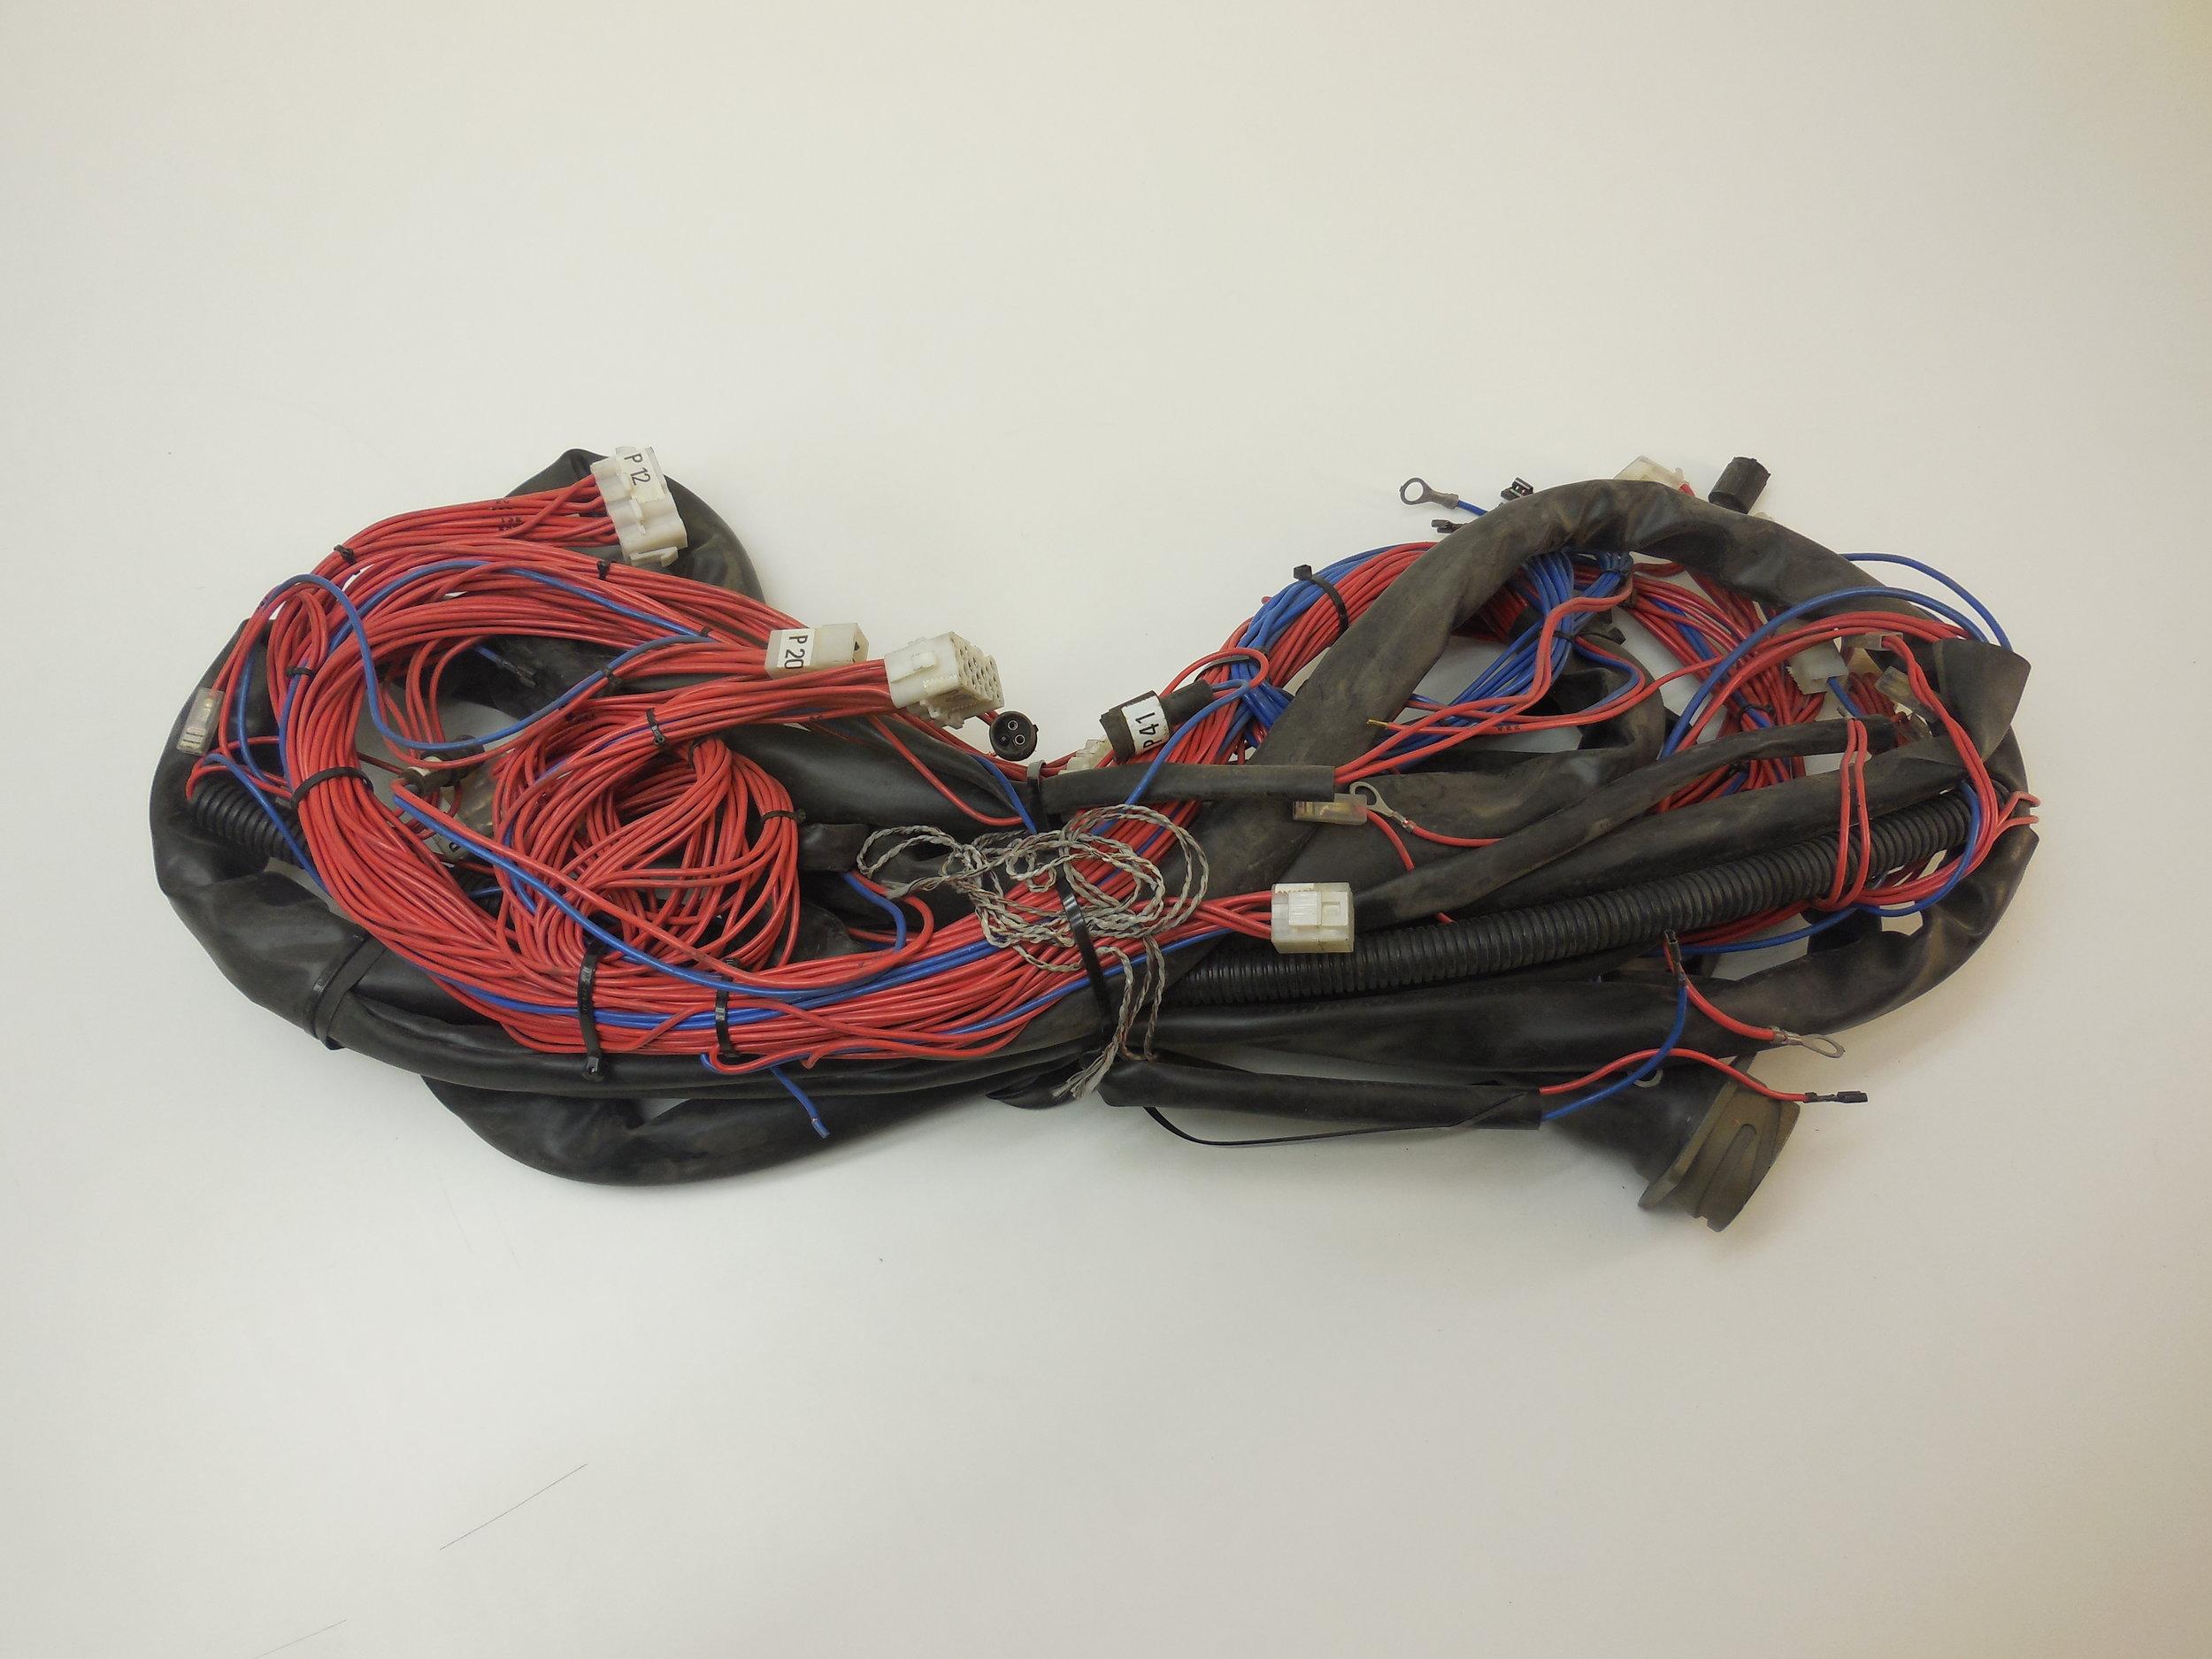 Cable bundel 1, back cabin bv D6   Häggo nr: 153 6439-801   Price: